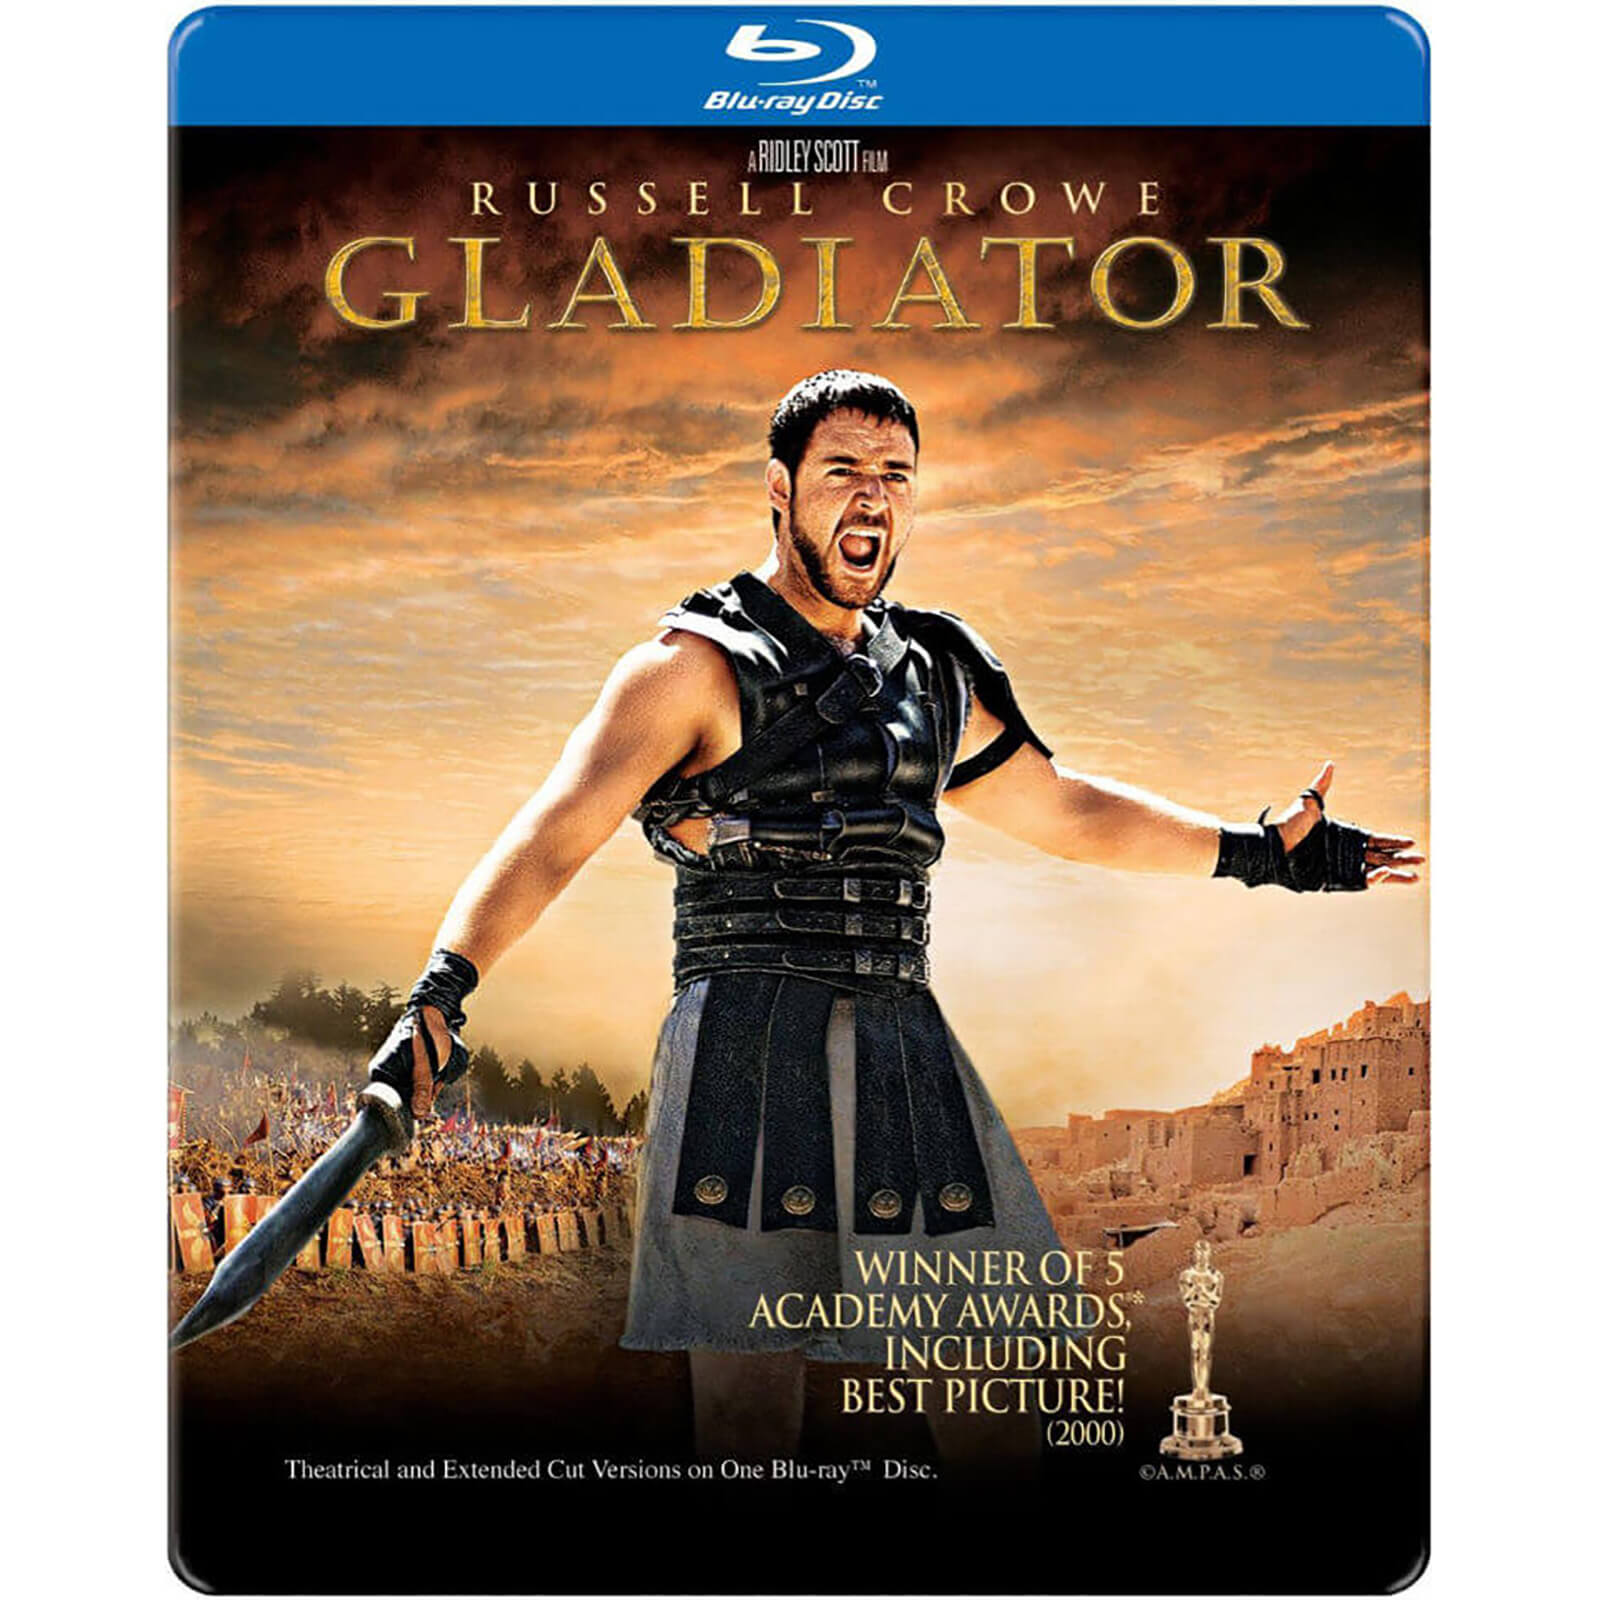 Gladiator - Import - Limited Edition Steelbook (Region 1)